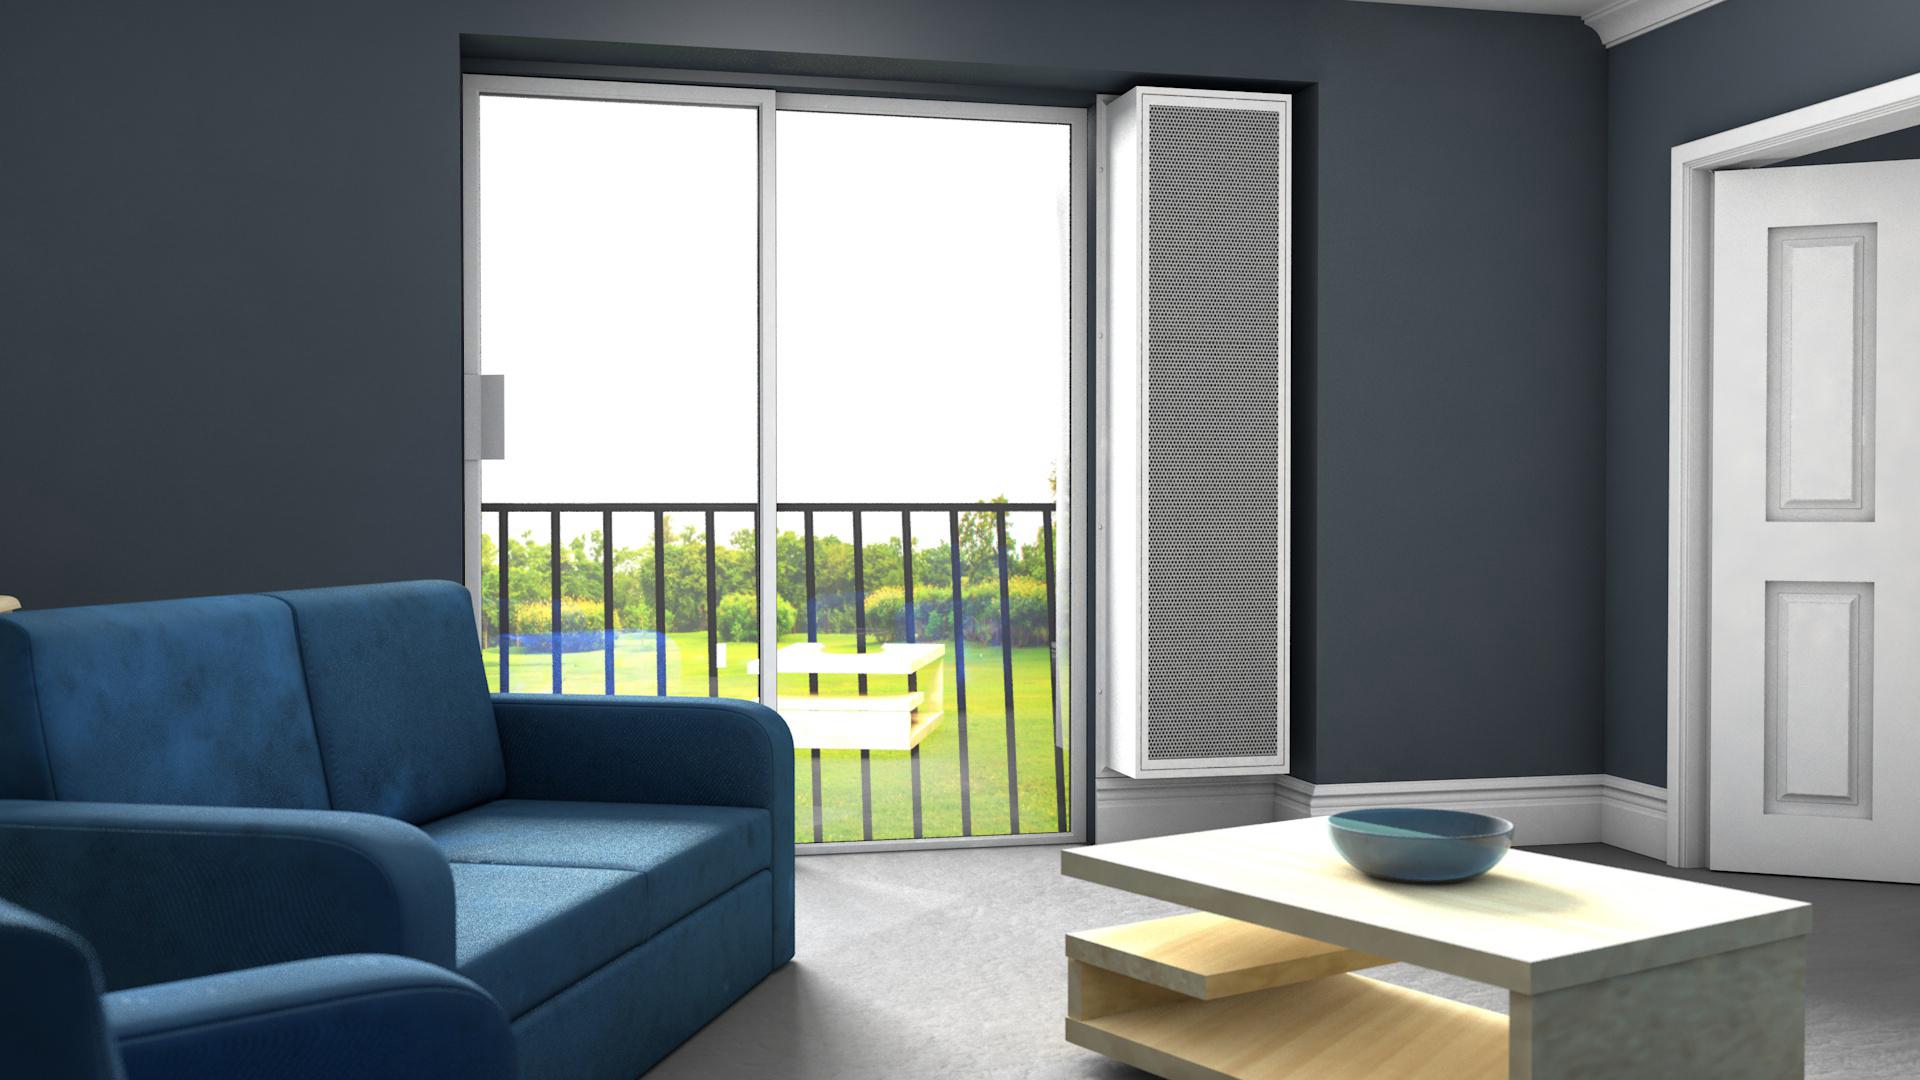 avo 04 - Residential Ventilation Unit - AVO4